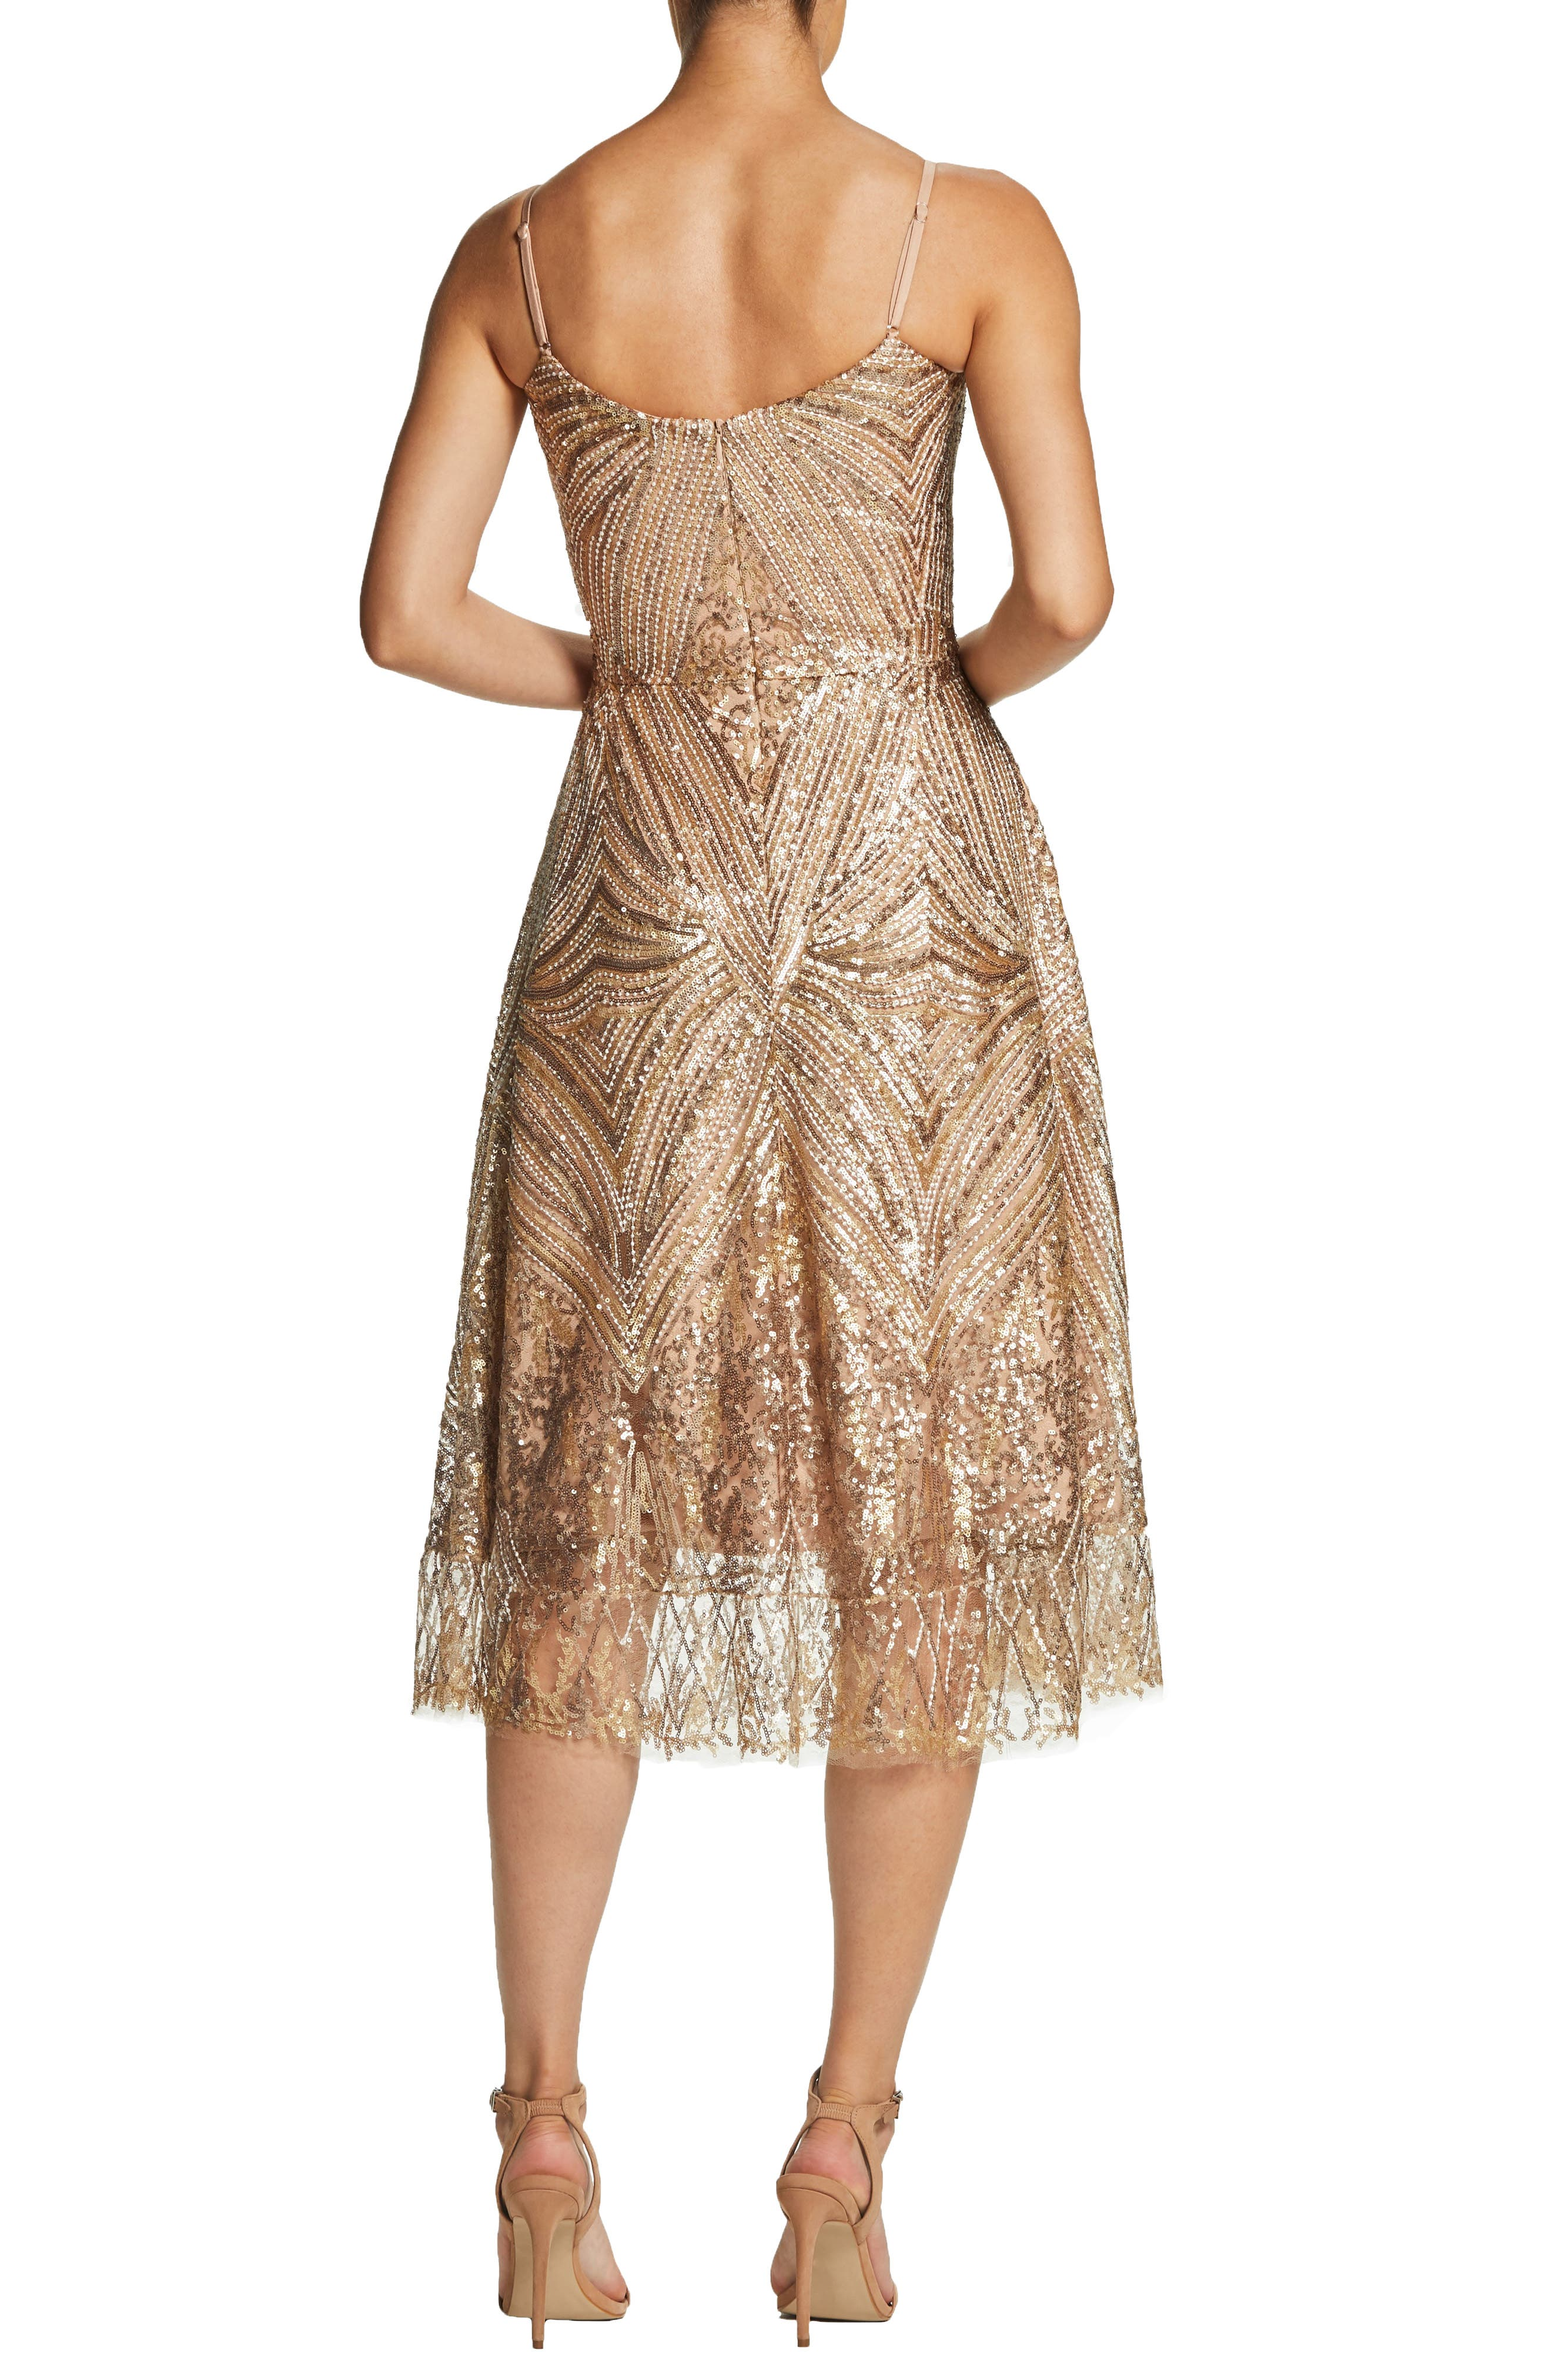 DRESS THE POPULATION,                             Leona Art Deco Sequin Fit & Flare Dress,                             Alternate thumbnail 2, color,                             GOLD/ BRASS